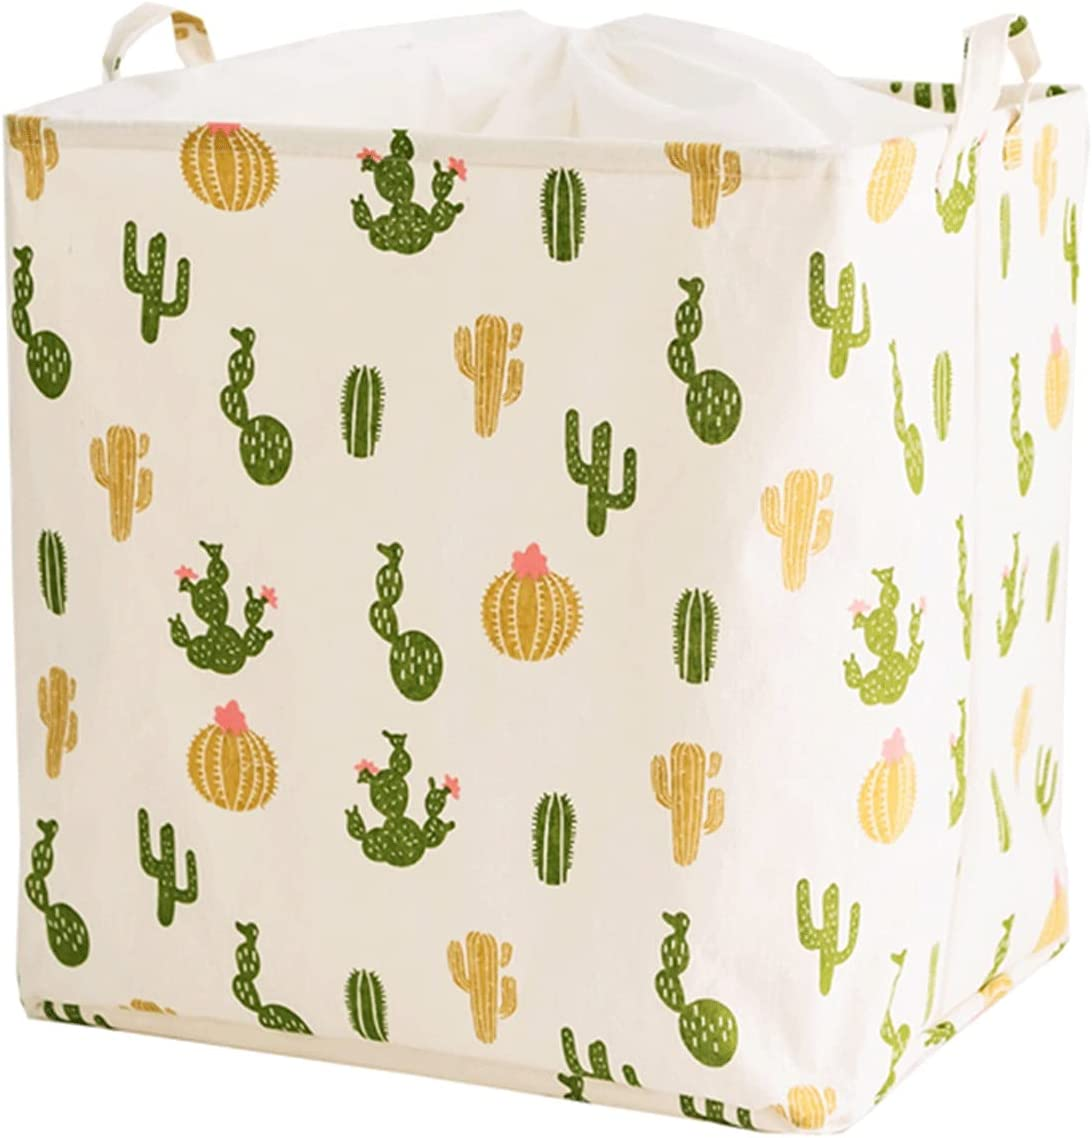 High material Large Foldable Laundry Blanket Finally popular brand Storage Bin Stripe Basket